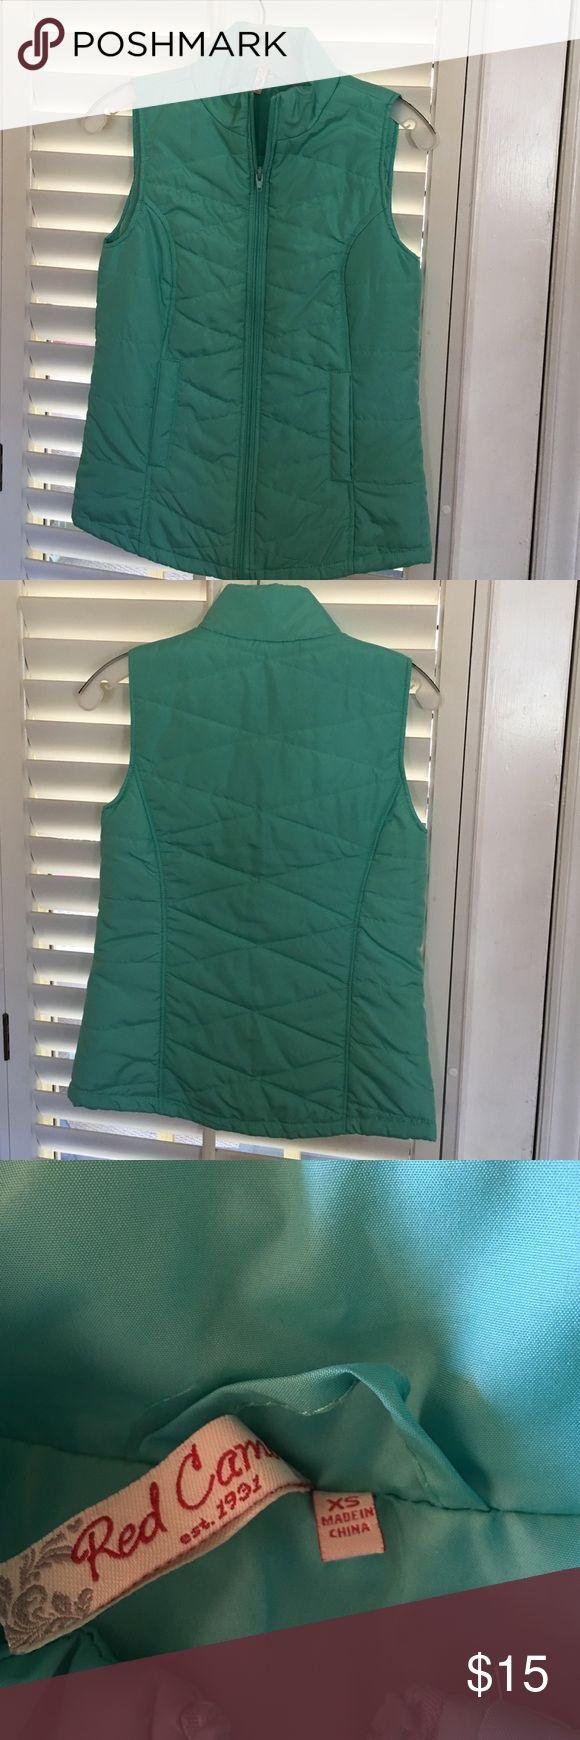 Red camel vest Red Camel light weight vest. Mint green size XS worn once Red Camel Jackets & Coats Vests